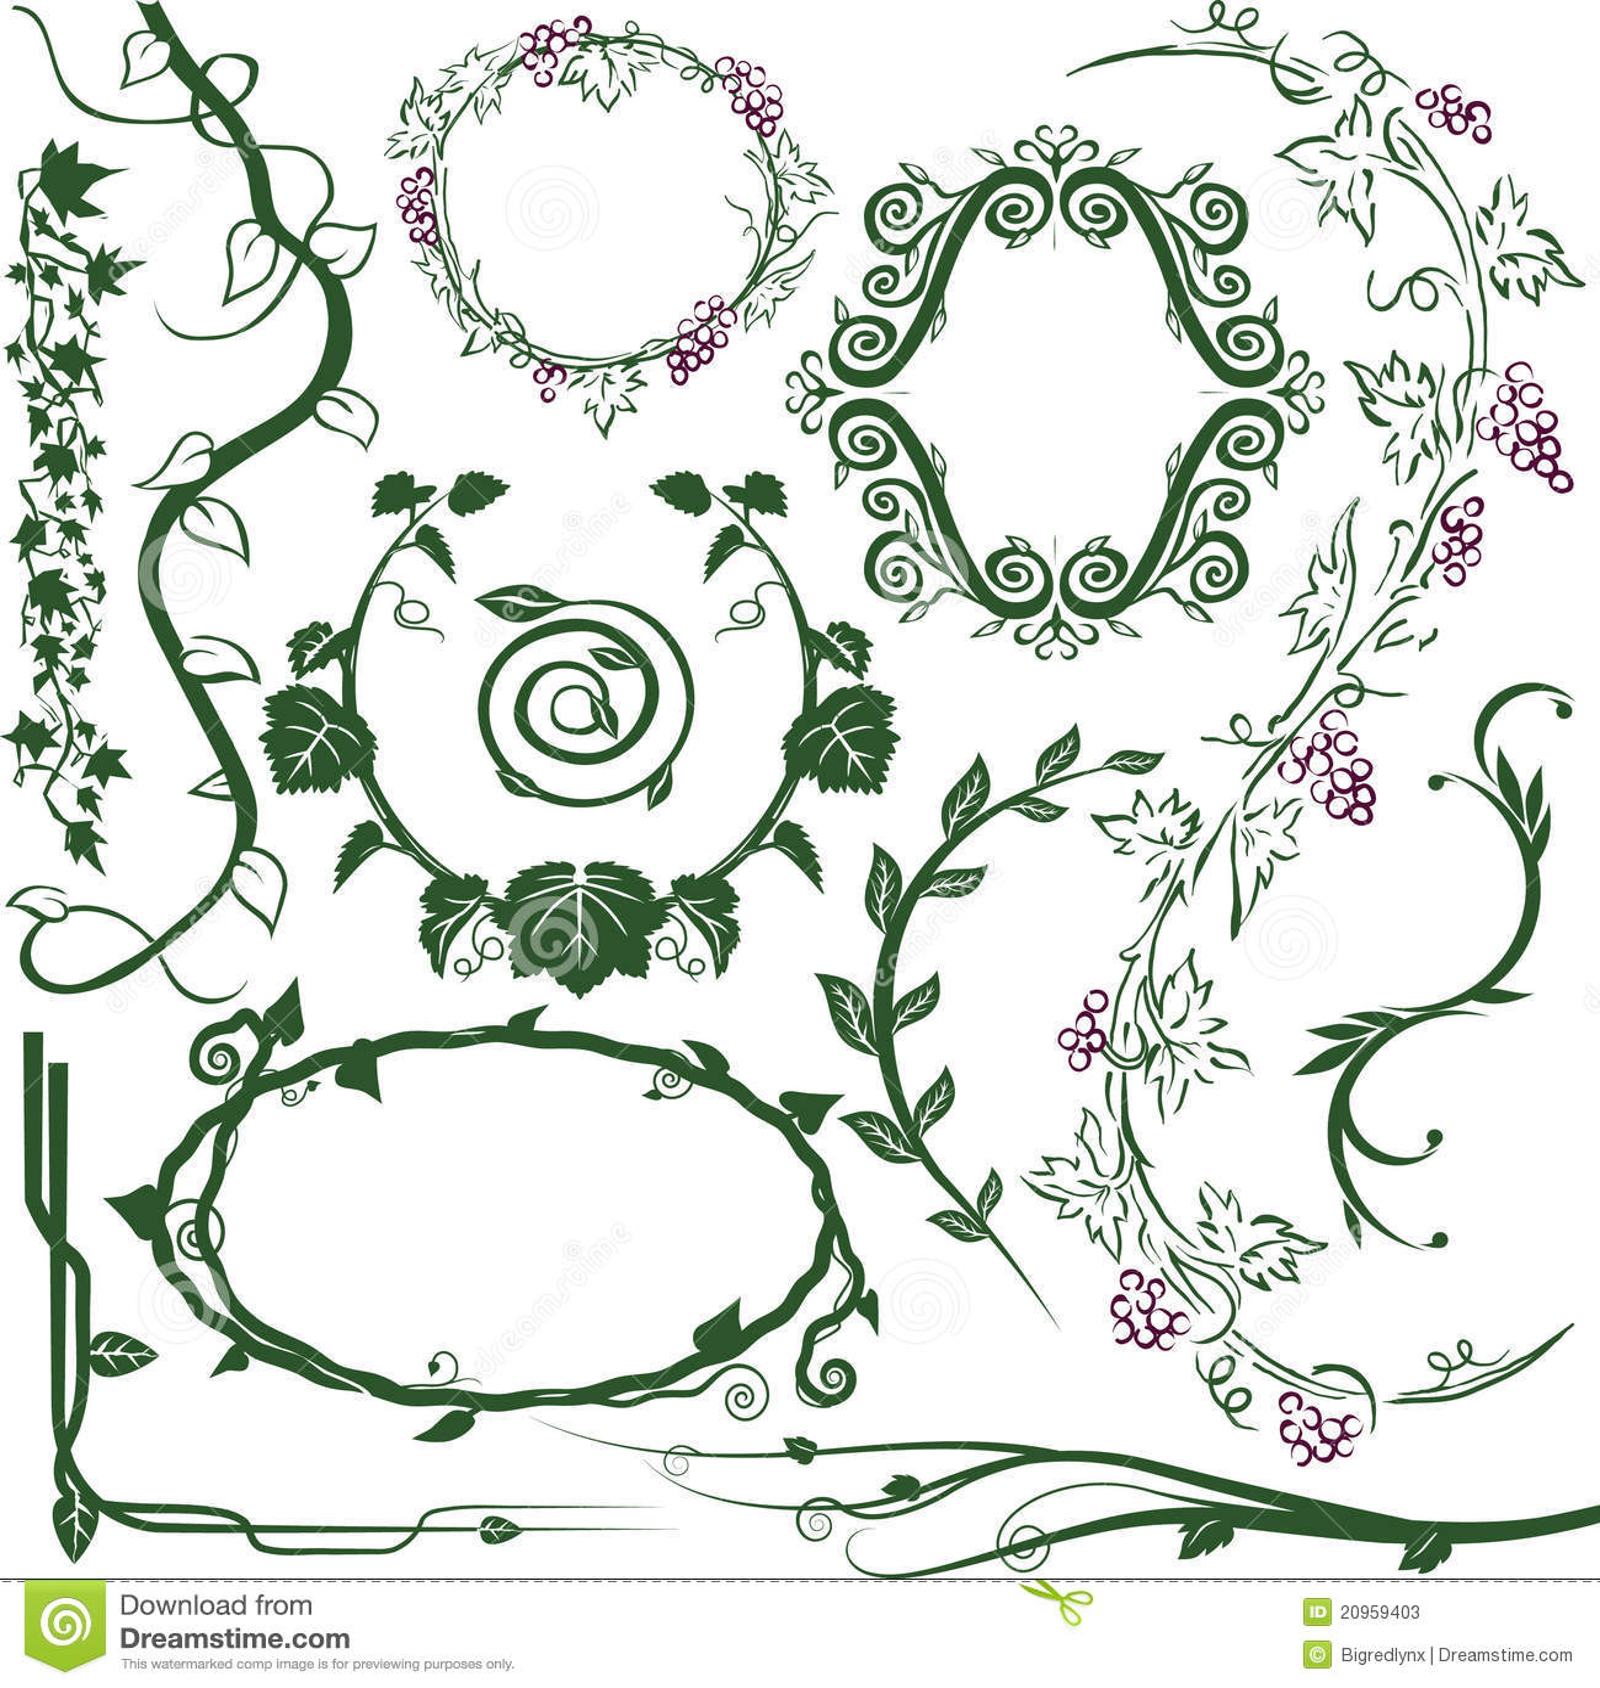 Flower Vine Line Drawing : Vine collection stock vector illustration of spiral